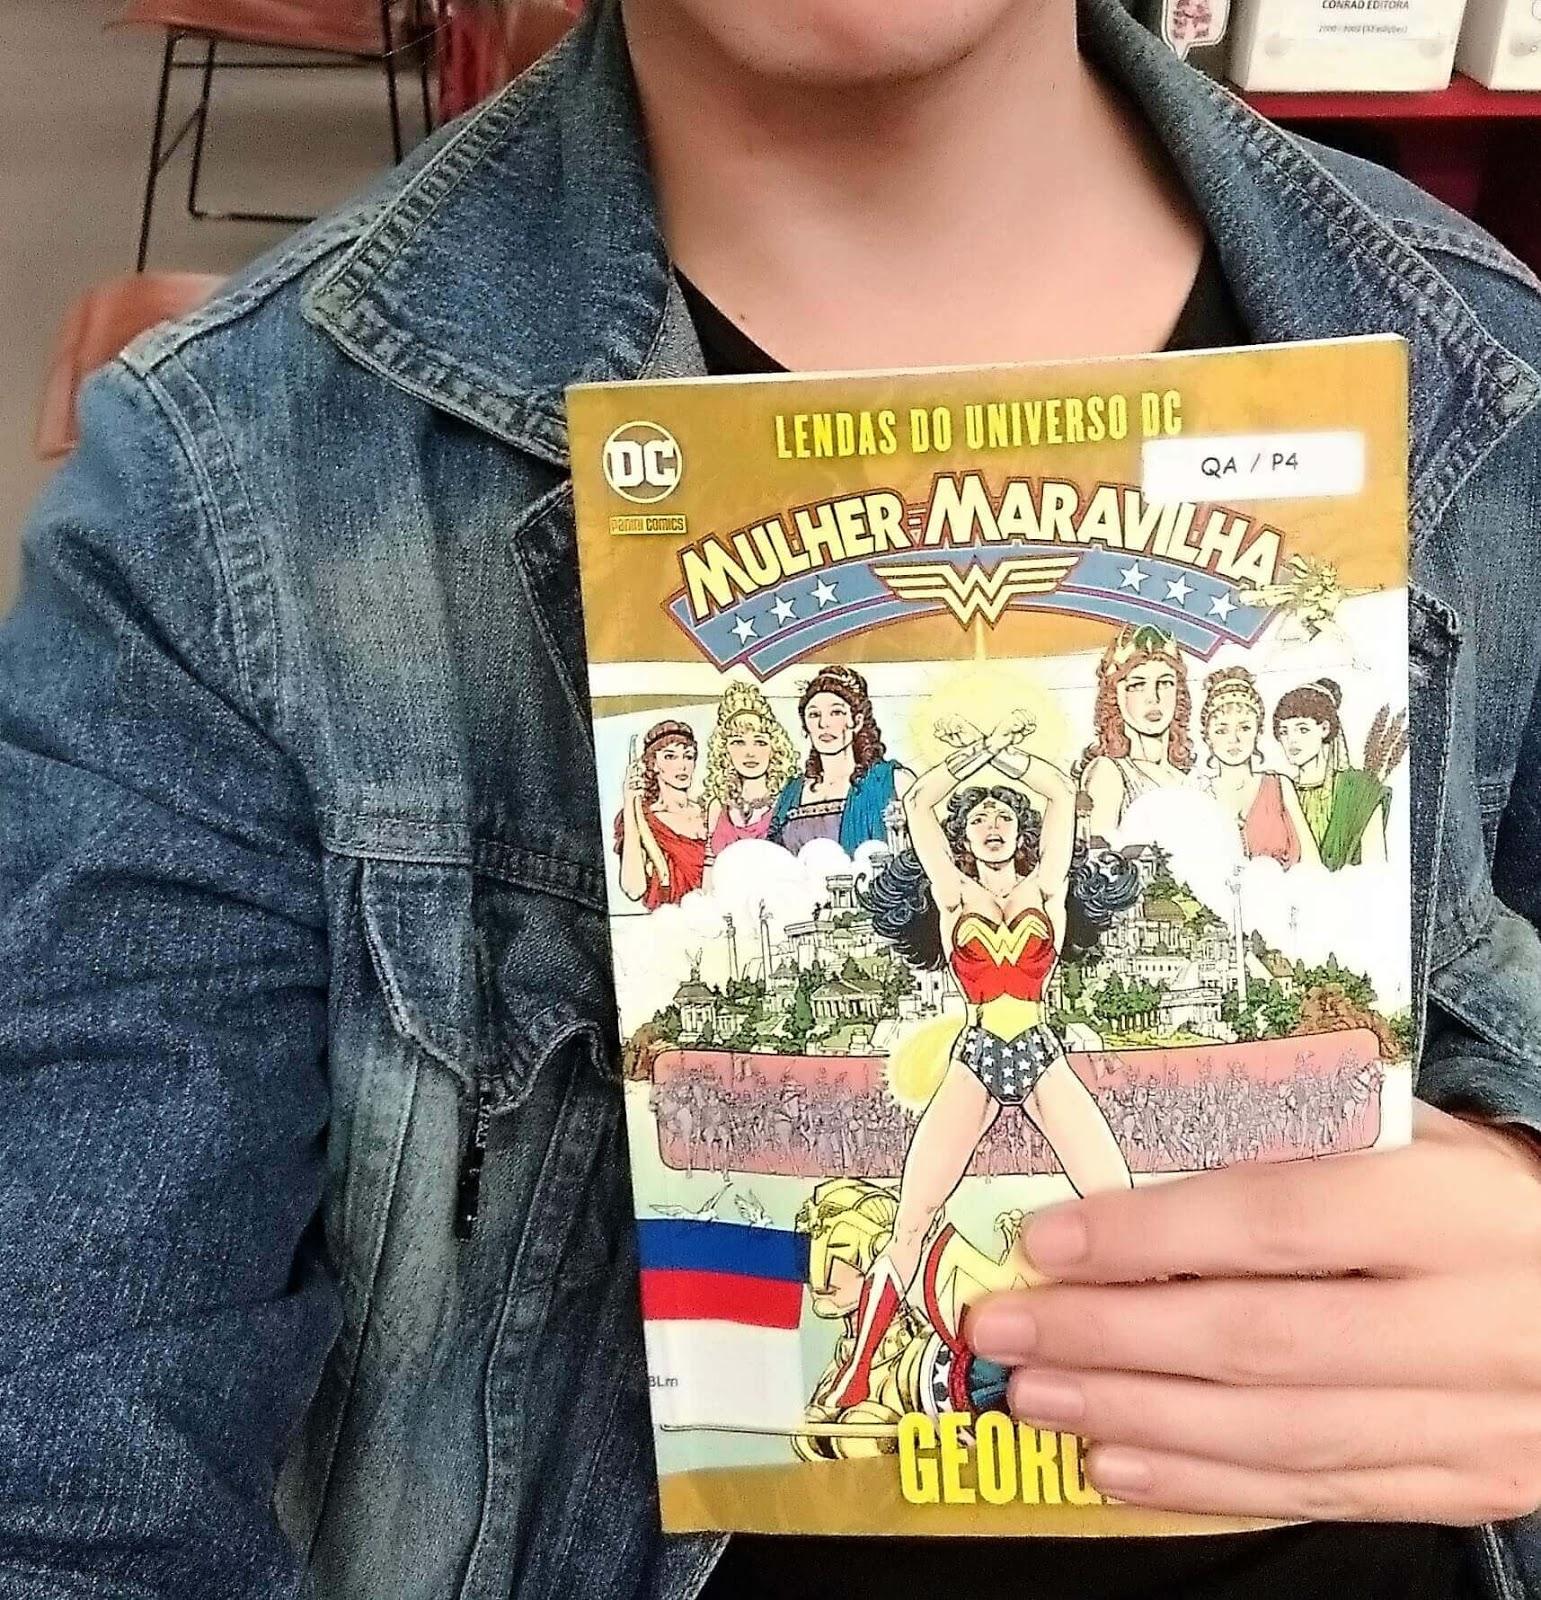 Mulher-Maravilha - George Perez - Gibiteca Henfil